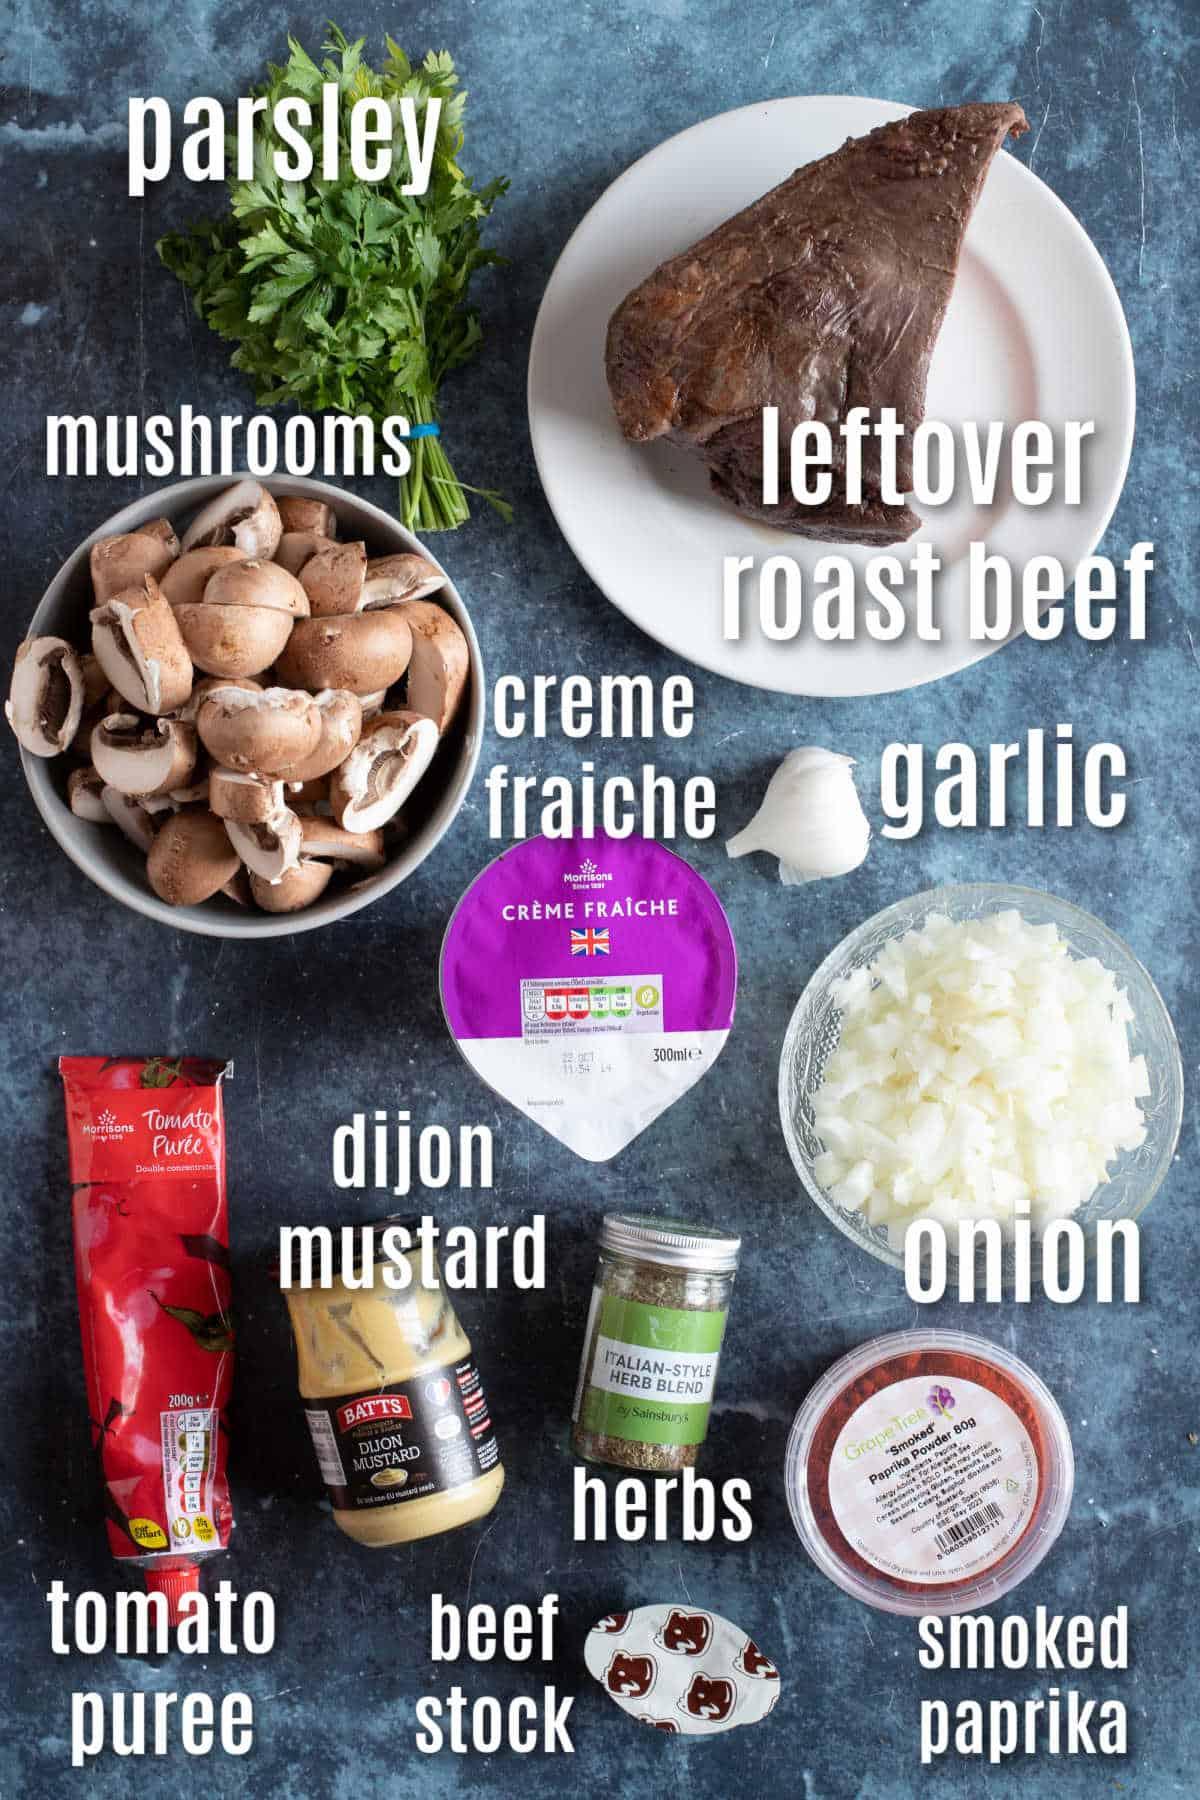 Ingredients needed to make leftover roast beef stroganoff.